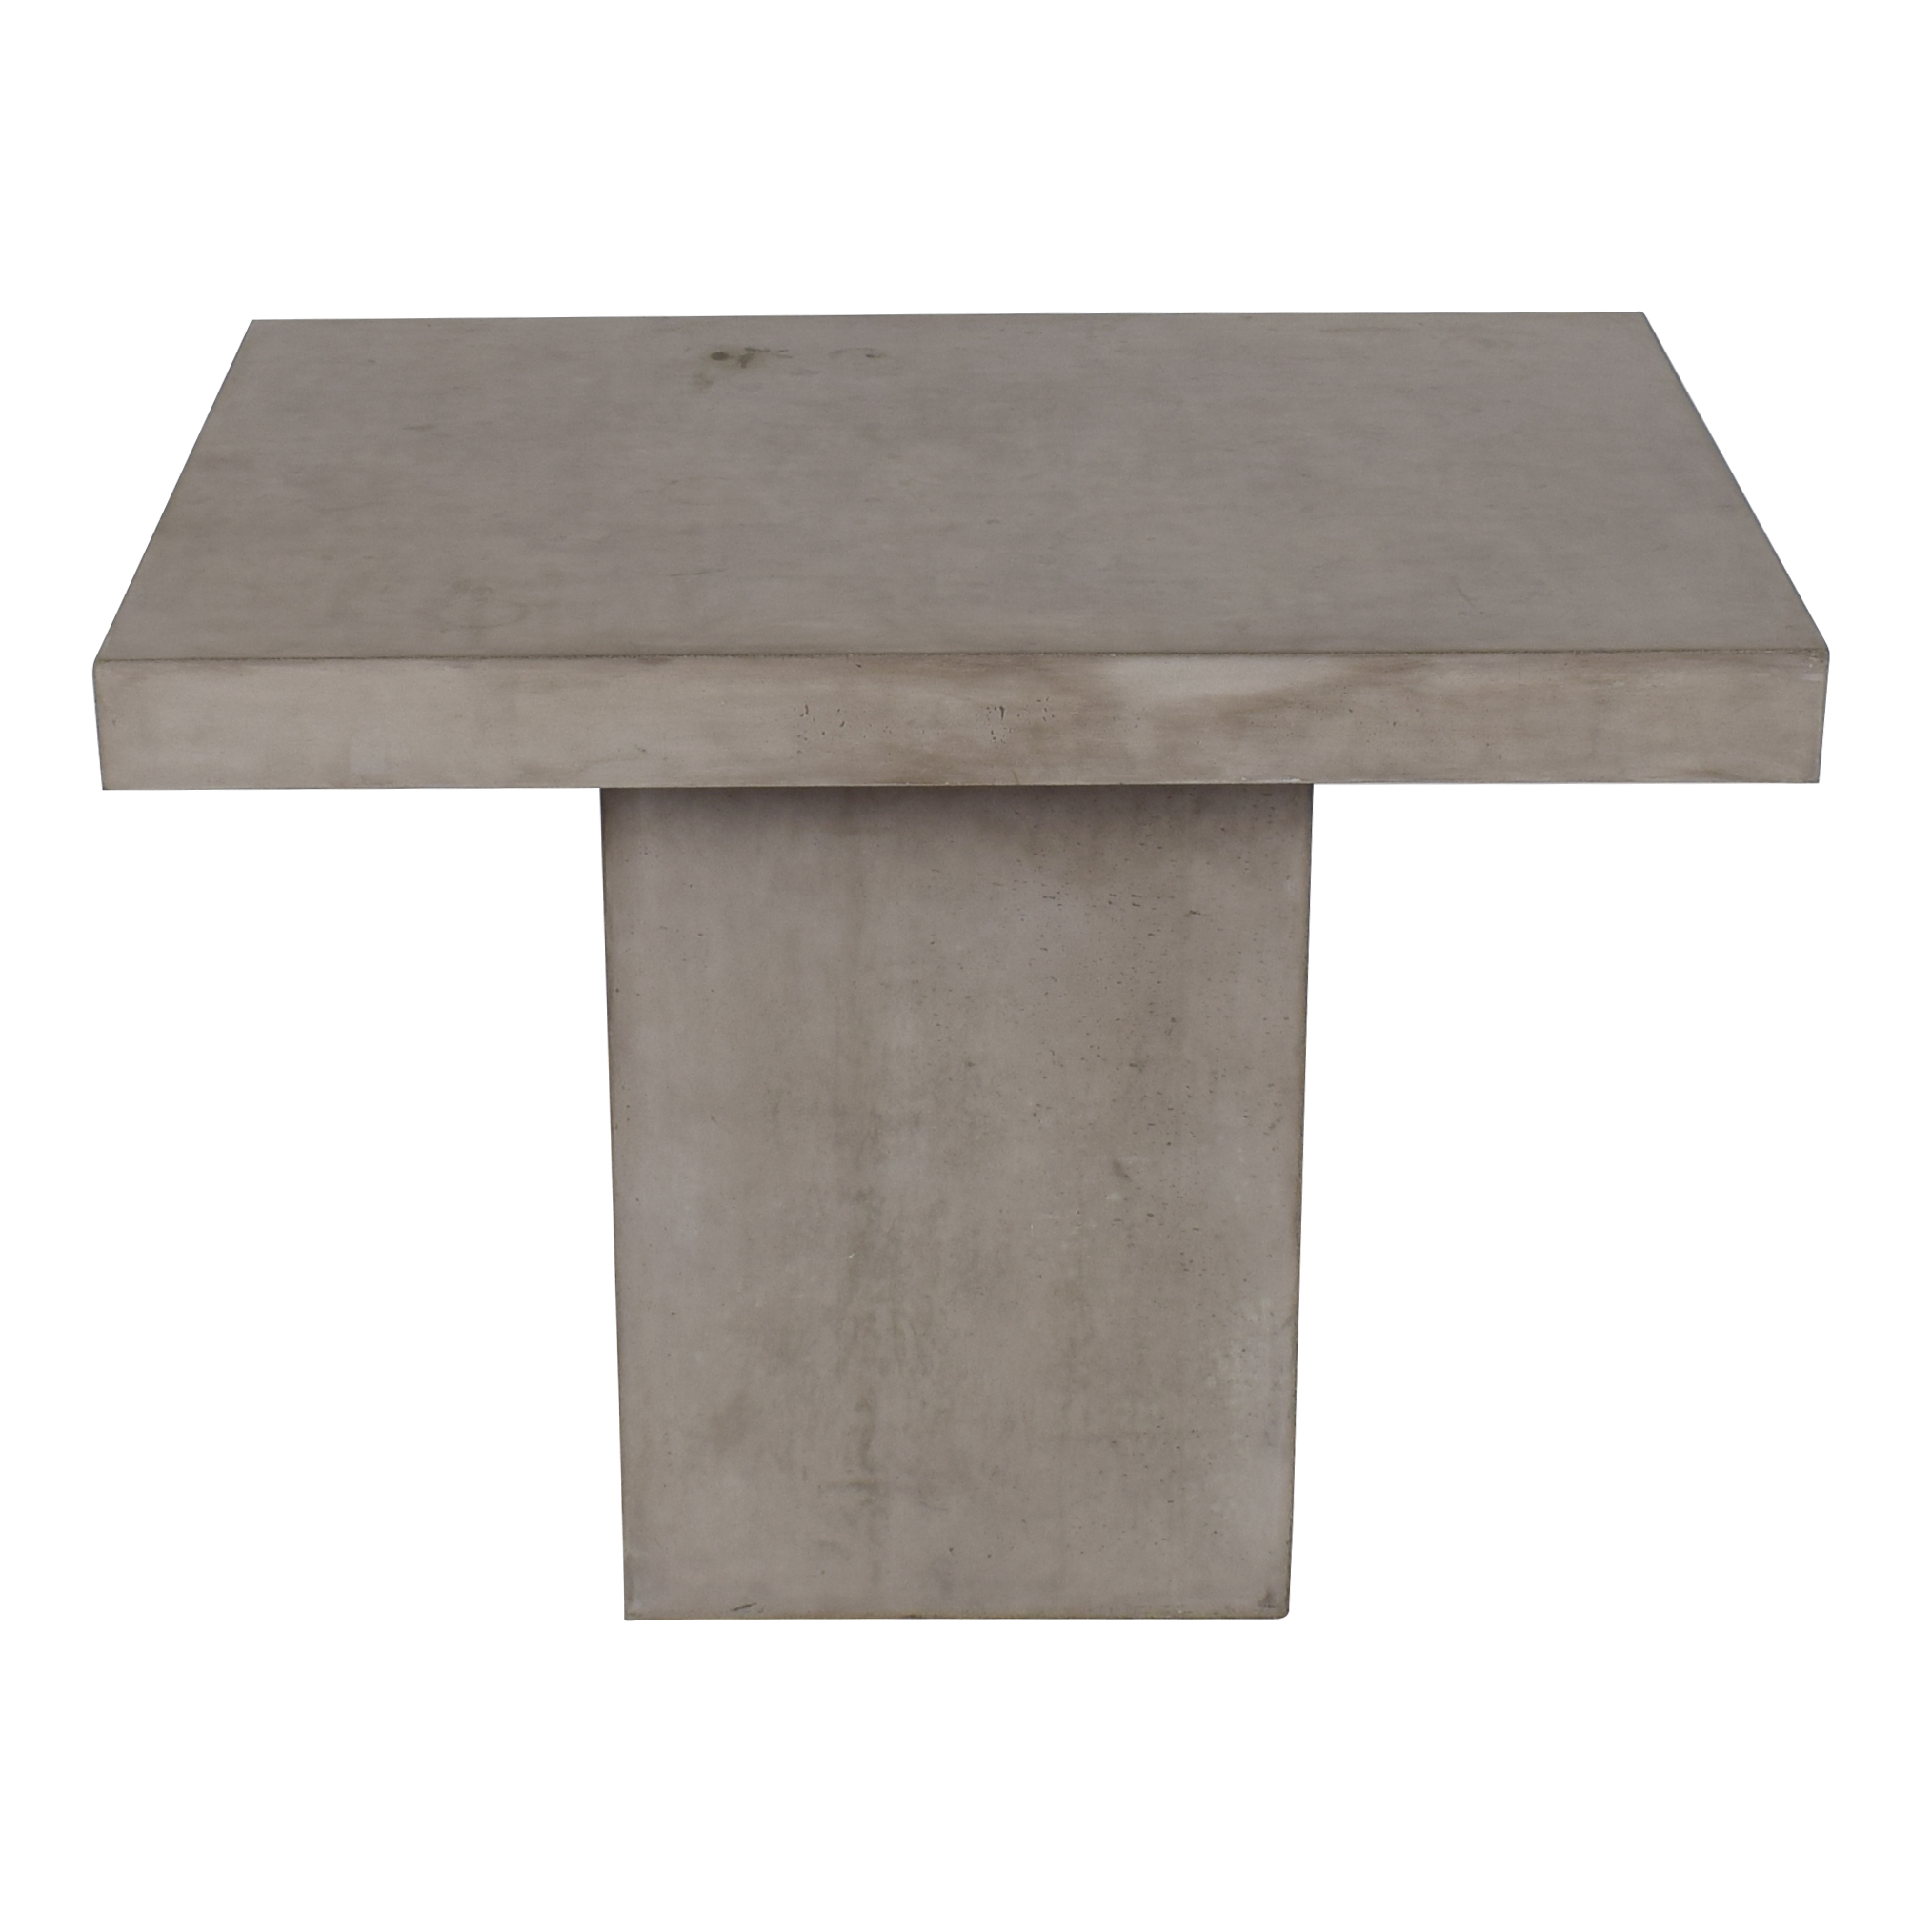 Seasonal Living Concrete Patio Table / Tables